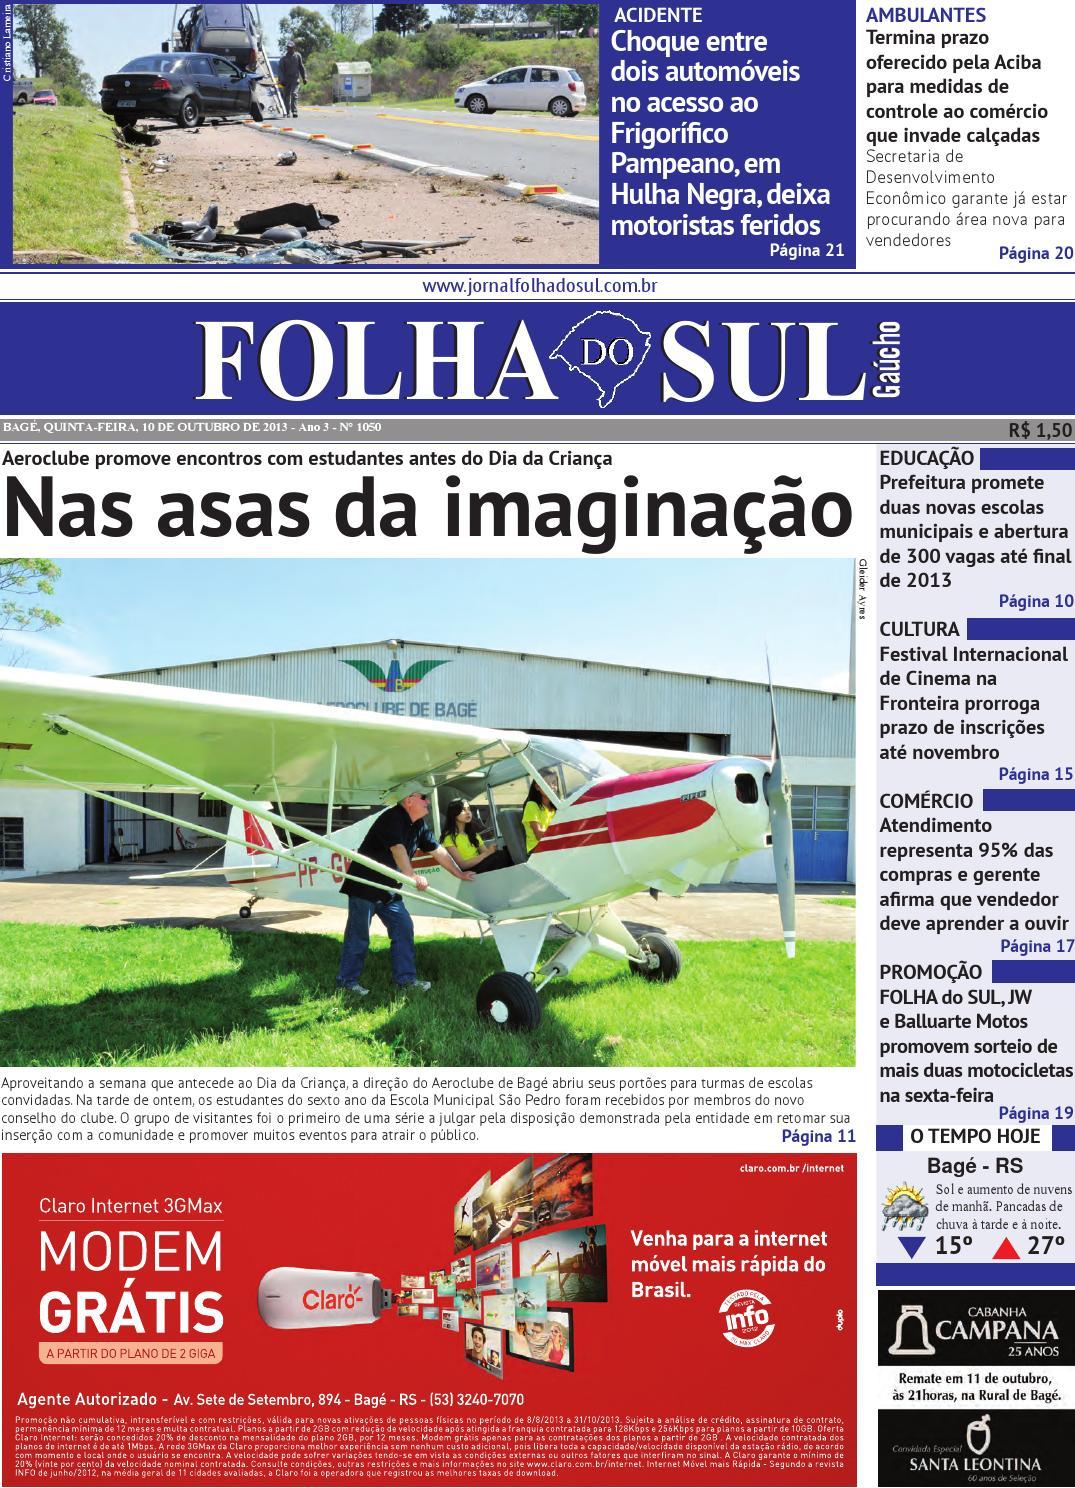 3b4a3d14a4f58 Folha do Sul Gaúcho Ed. 1050 (10 10 2013) by Folha do Sul Gaúcho - issuu